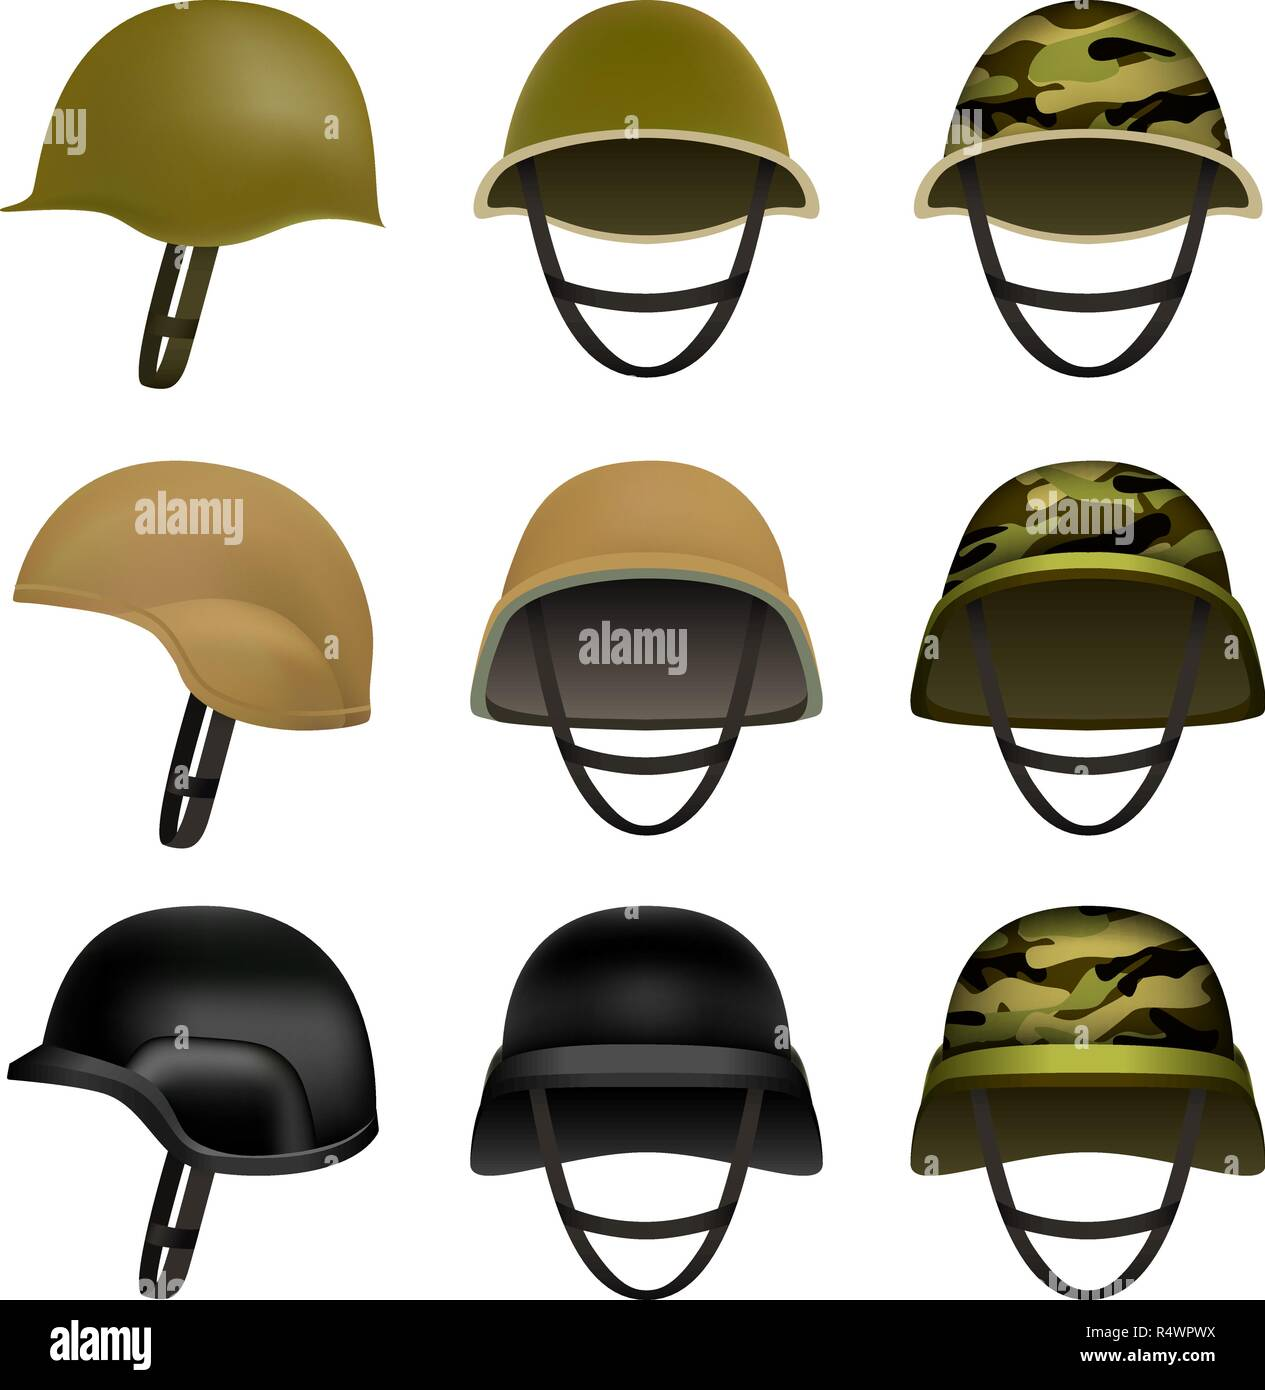 Army helmet soldier military hat mockup set. Flat illustration of 9 army helmet soldier military hat vector mockups for web Stock Vector